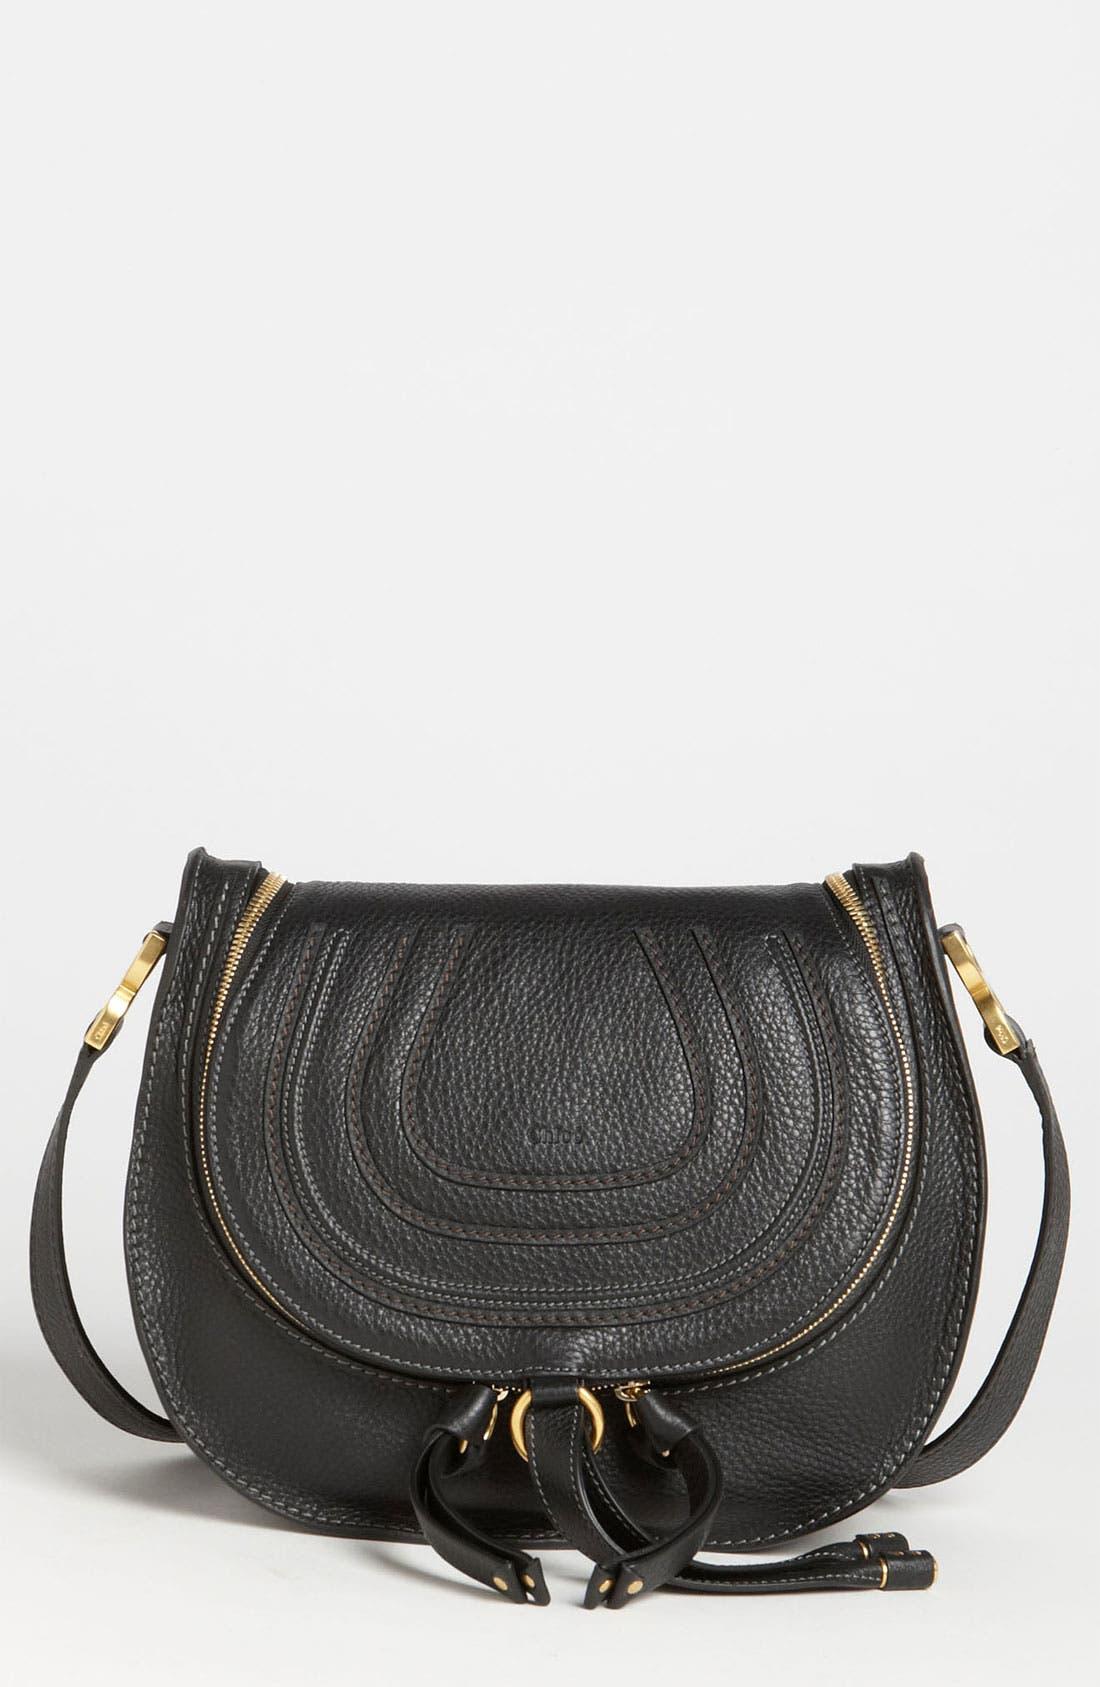 Alternate Image 1 Selected - Chloé 'Marcie' Leather Crossbody Bag